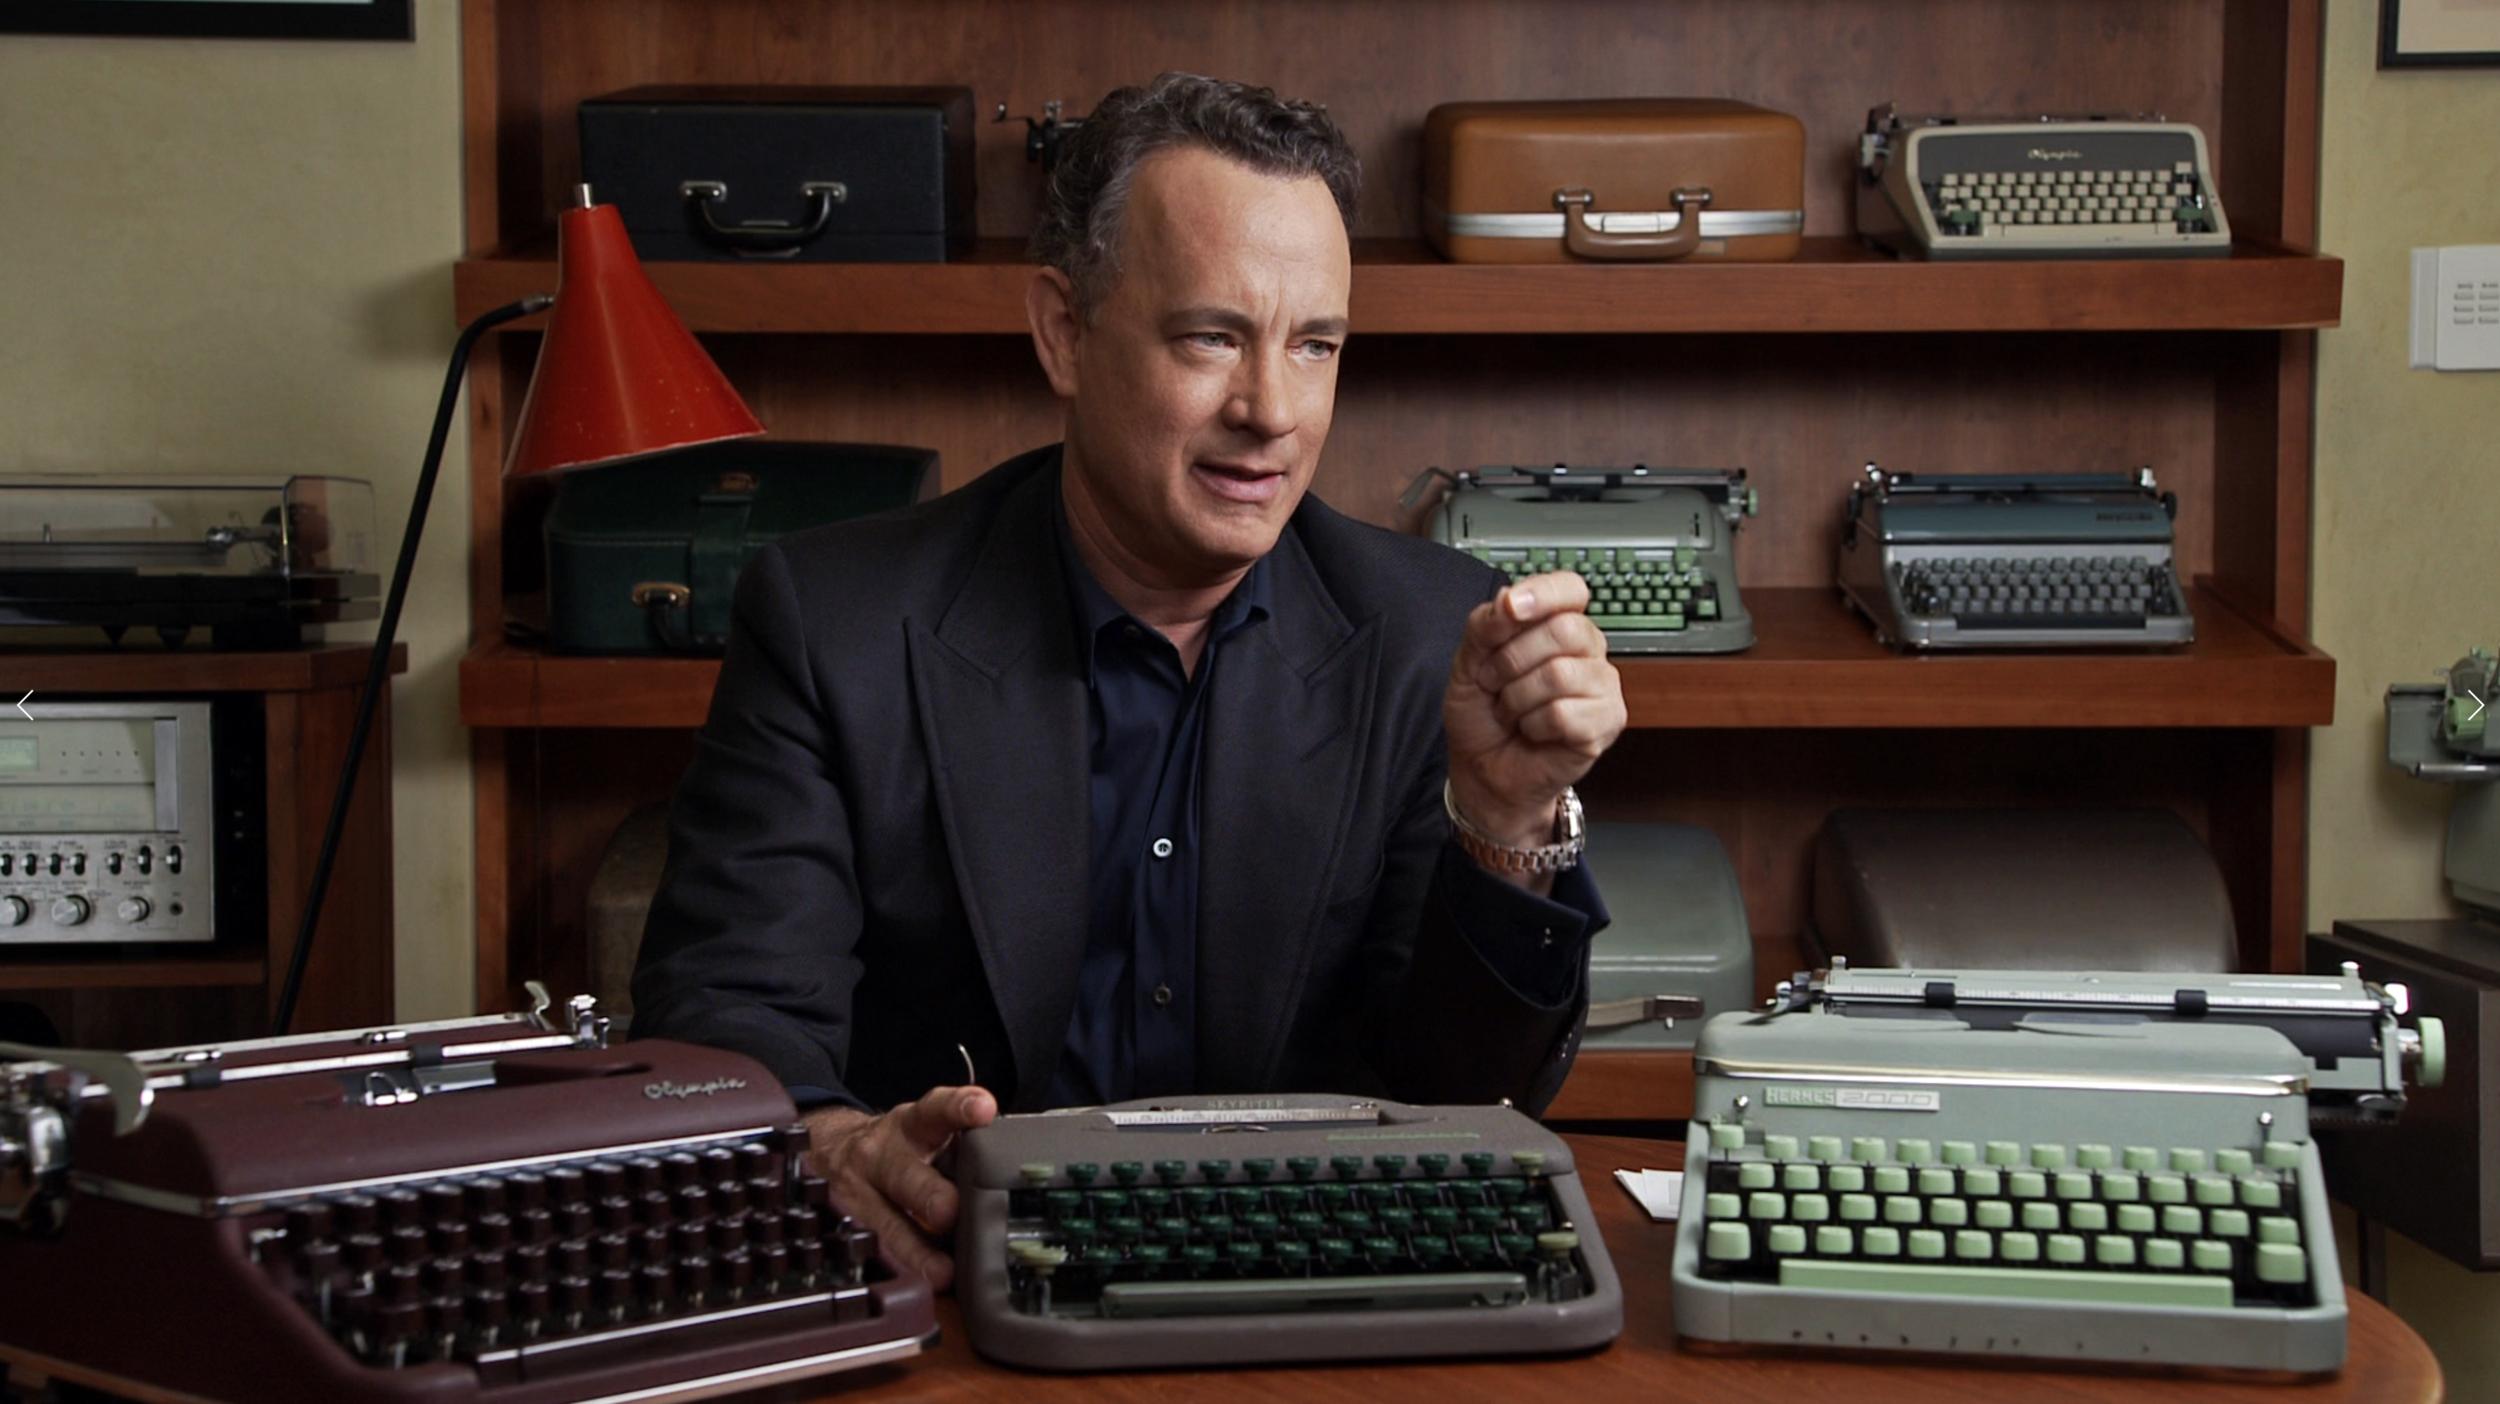 """No good typewriter will ever be made again."" - Tom Hanks, California Typewritter"